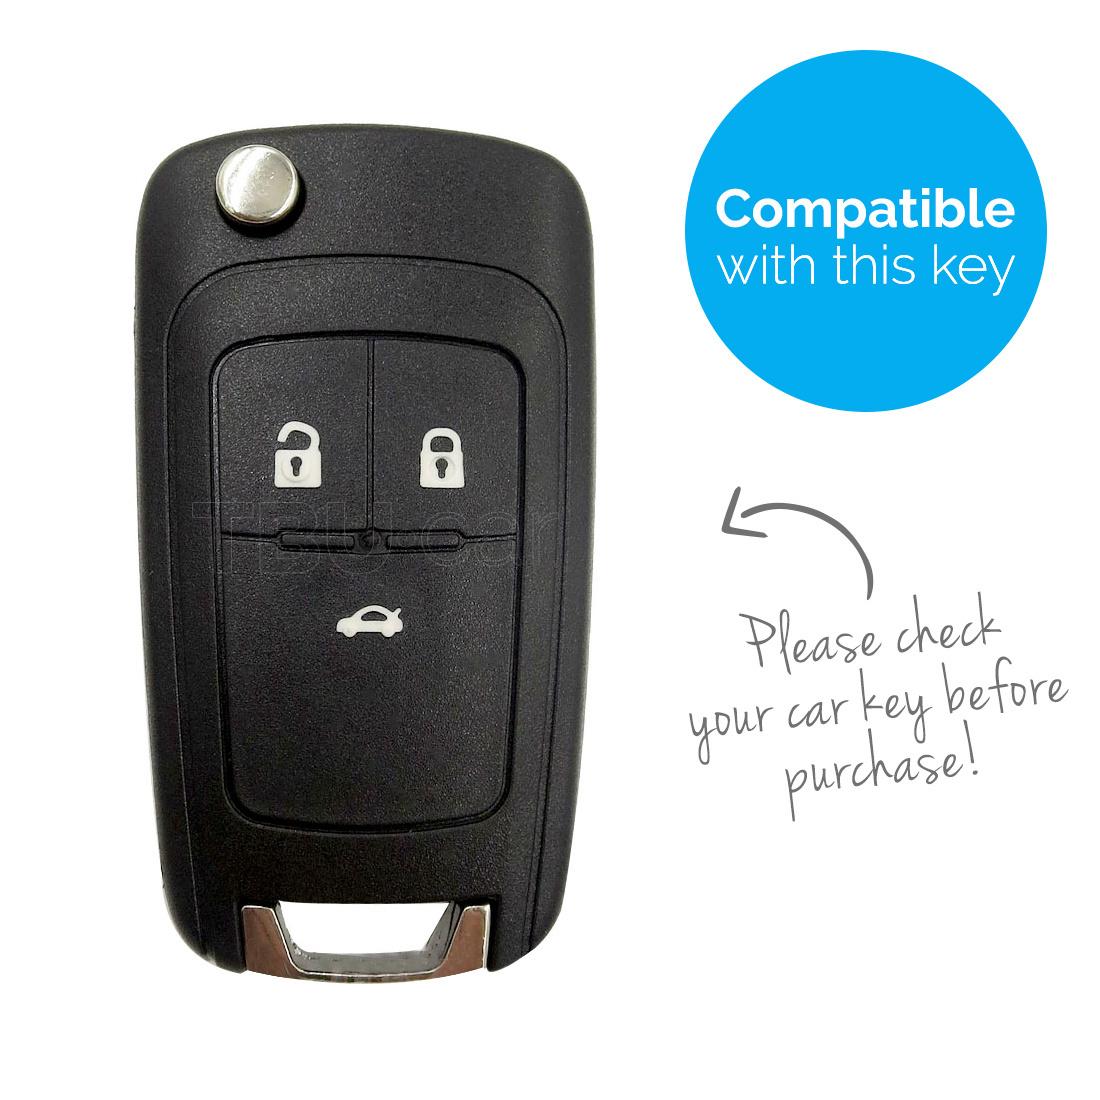 TBU car TBU car Autoschlüssel Hülle kompatibel mit Chevrolet 3 Tasten - Schutzhülle aus Silikon - Auto Schlüsselhülle Cover in Rosa